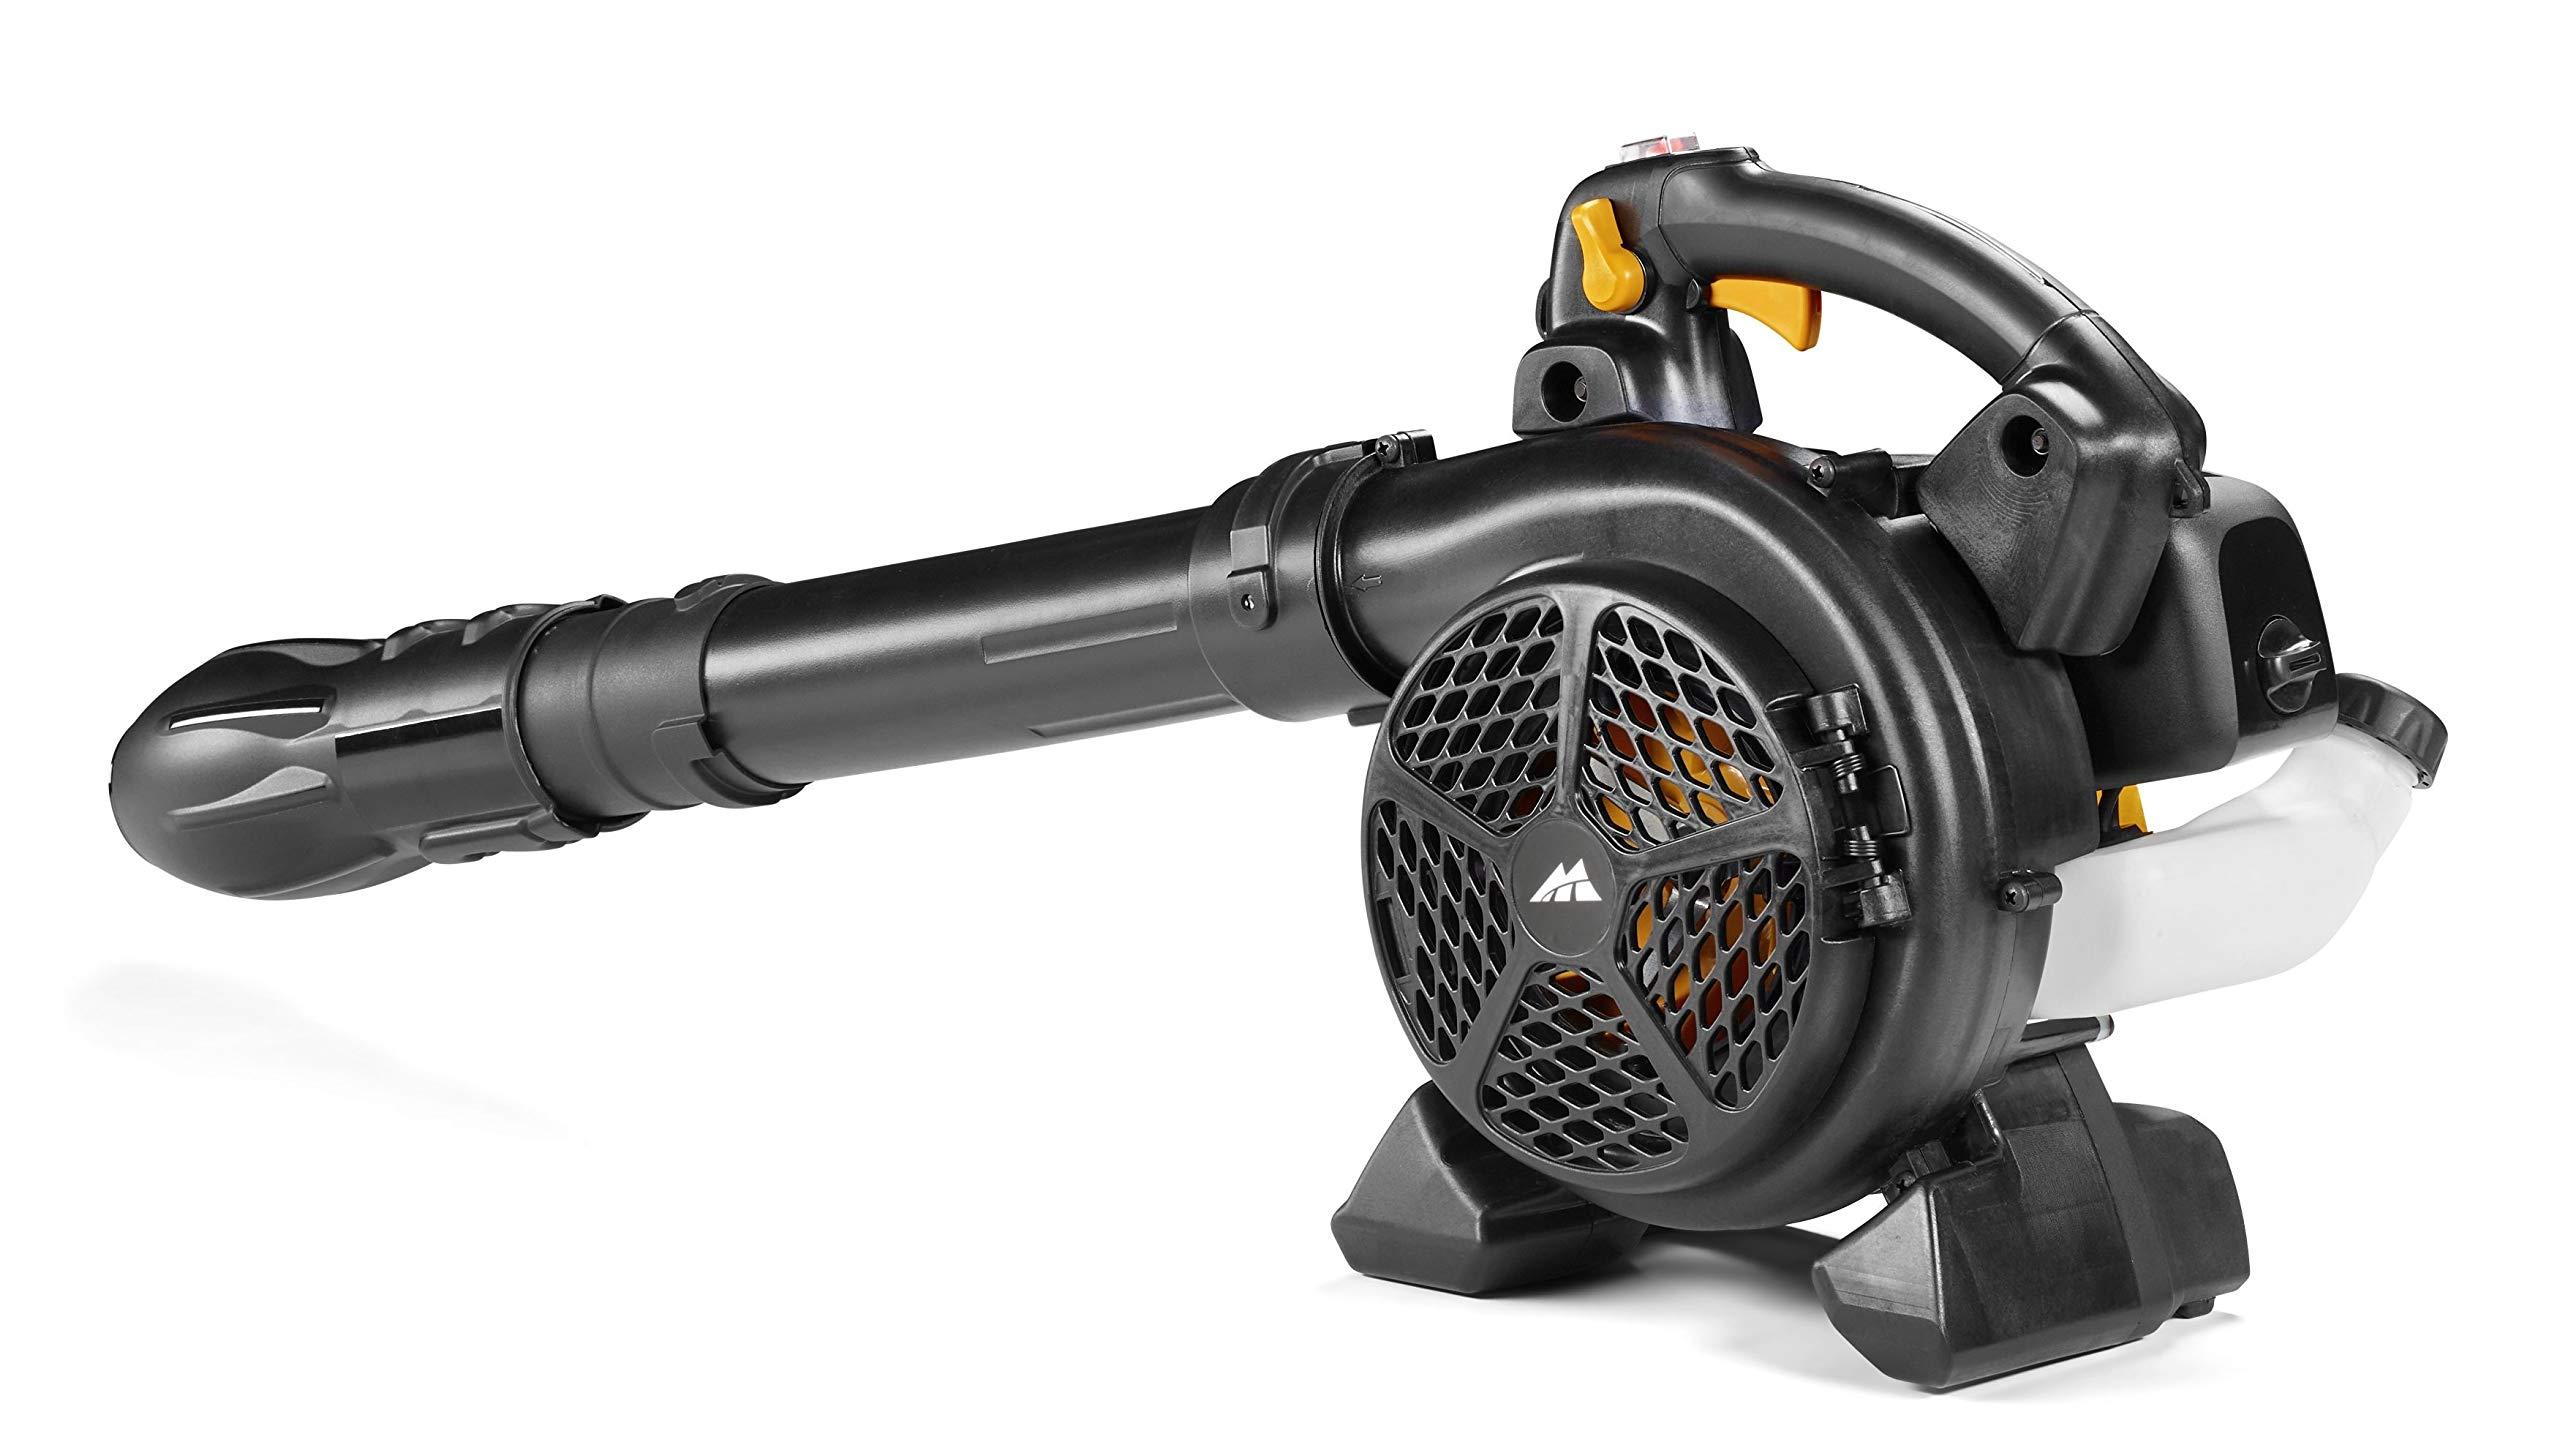 McCulloch GBV 322 VX Petrol Leaf Blower/Garden Vacuum: 800 W Engine, 45 Litre Vac Bag Capacity, 370 km/h, Full Anti…